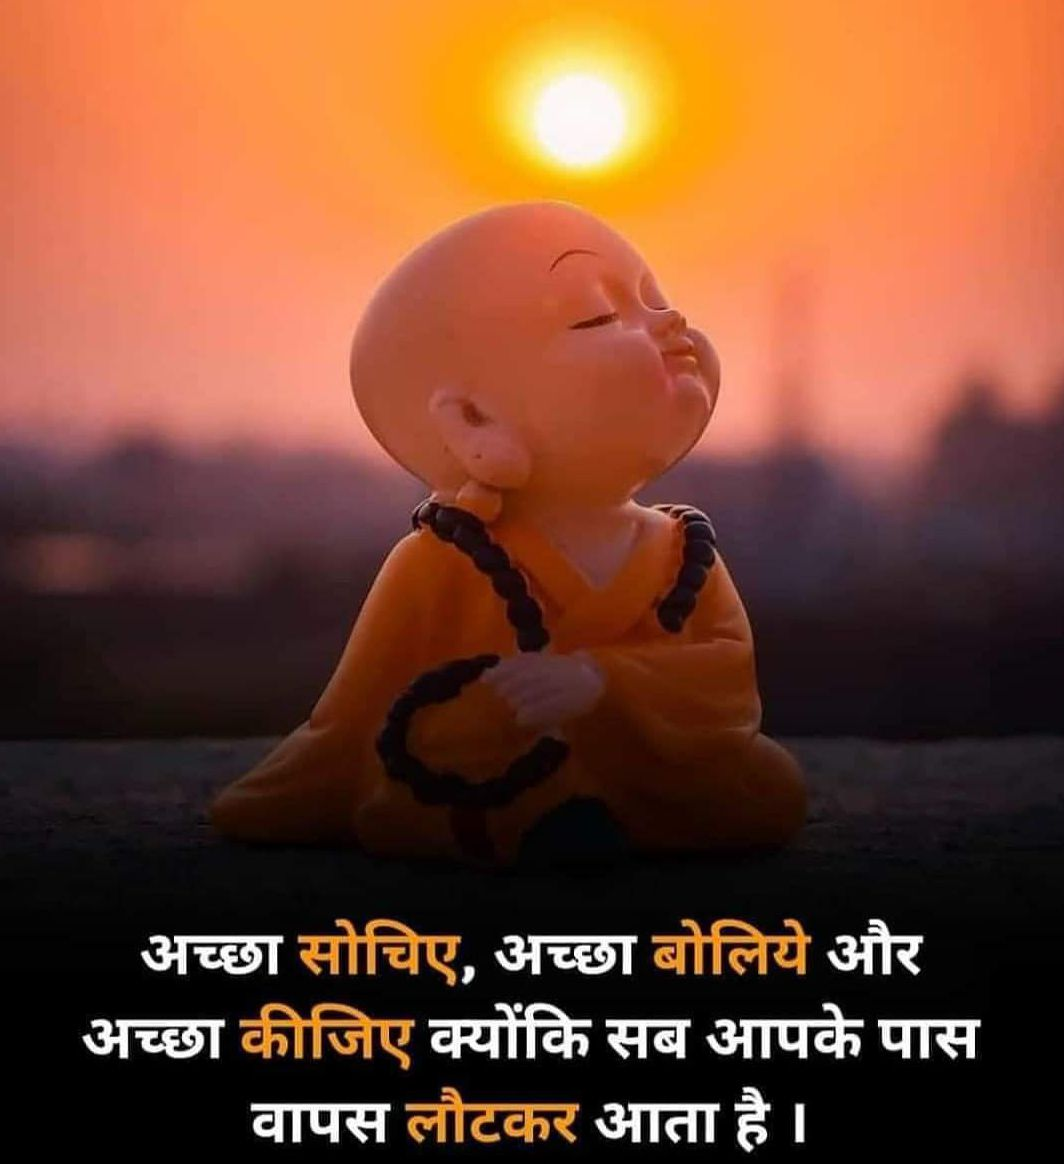 Good Morning Instagram Captions in Hindi